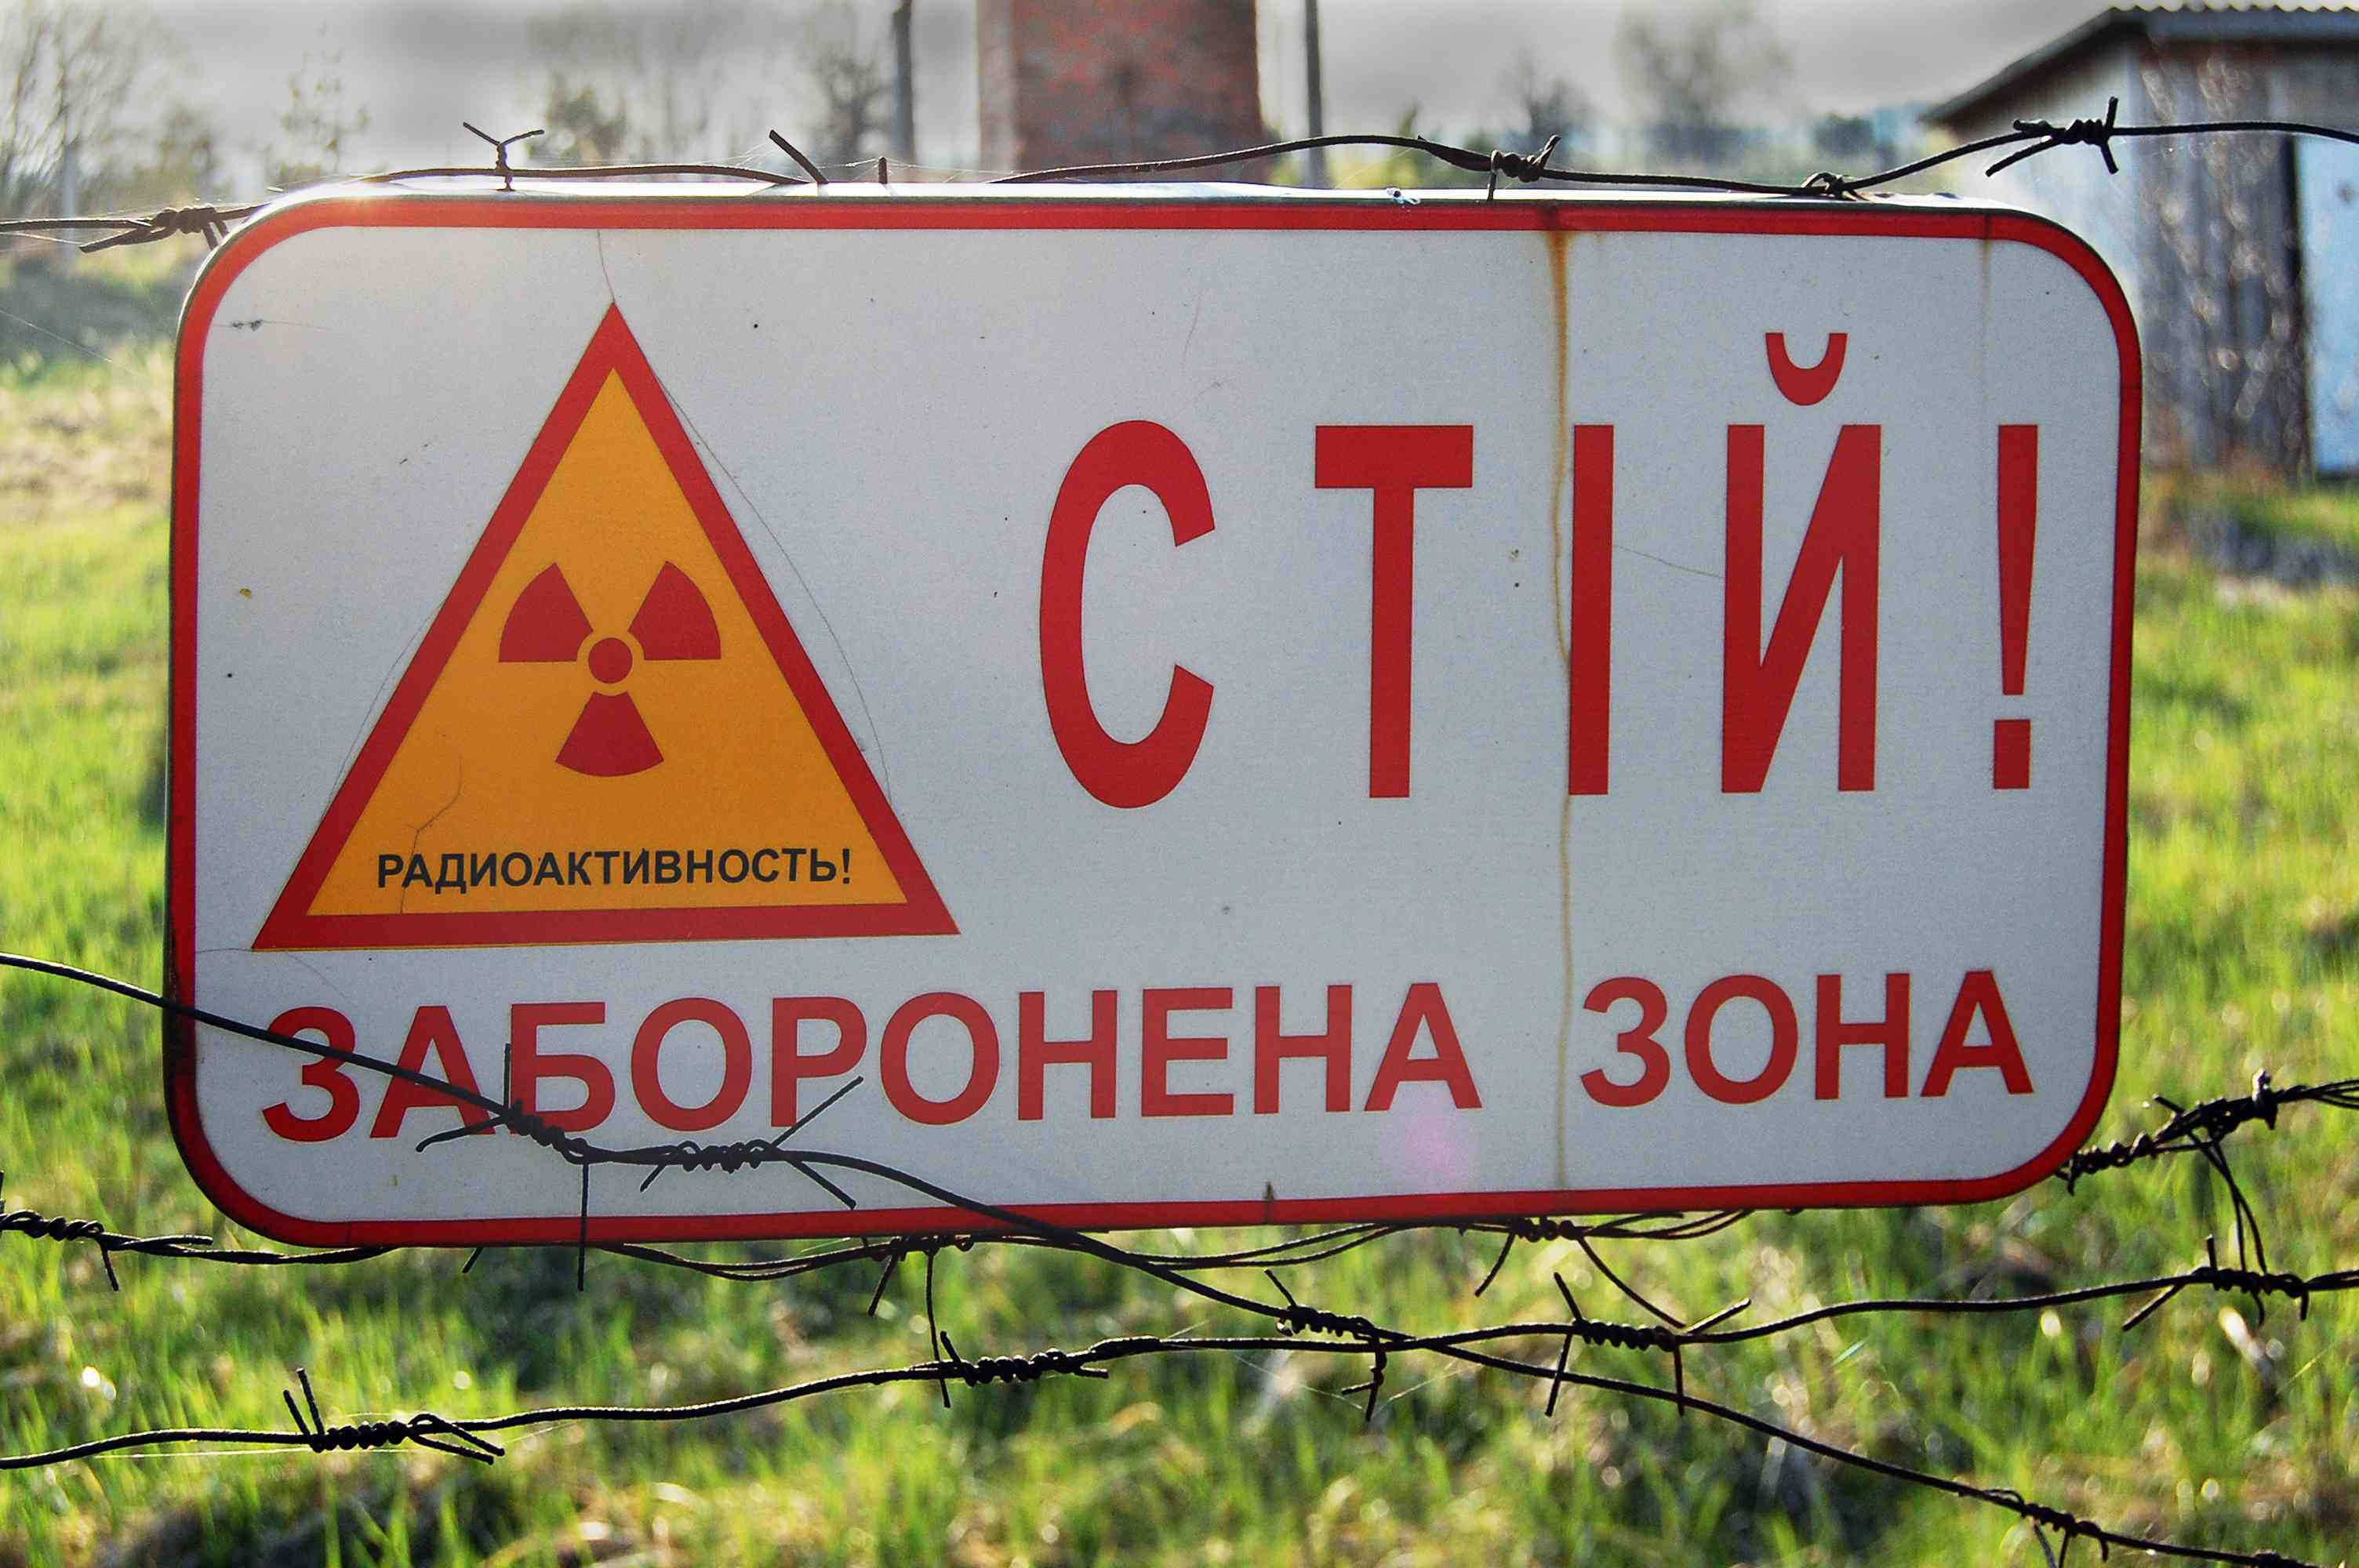 Chernobyl sign, Ukraine